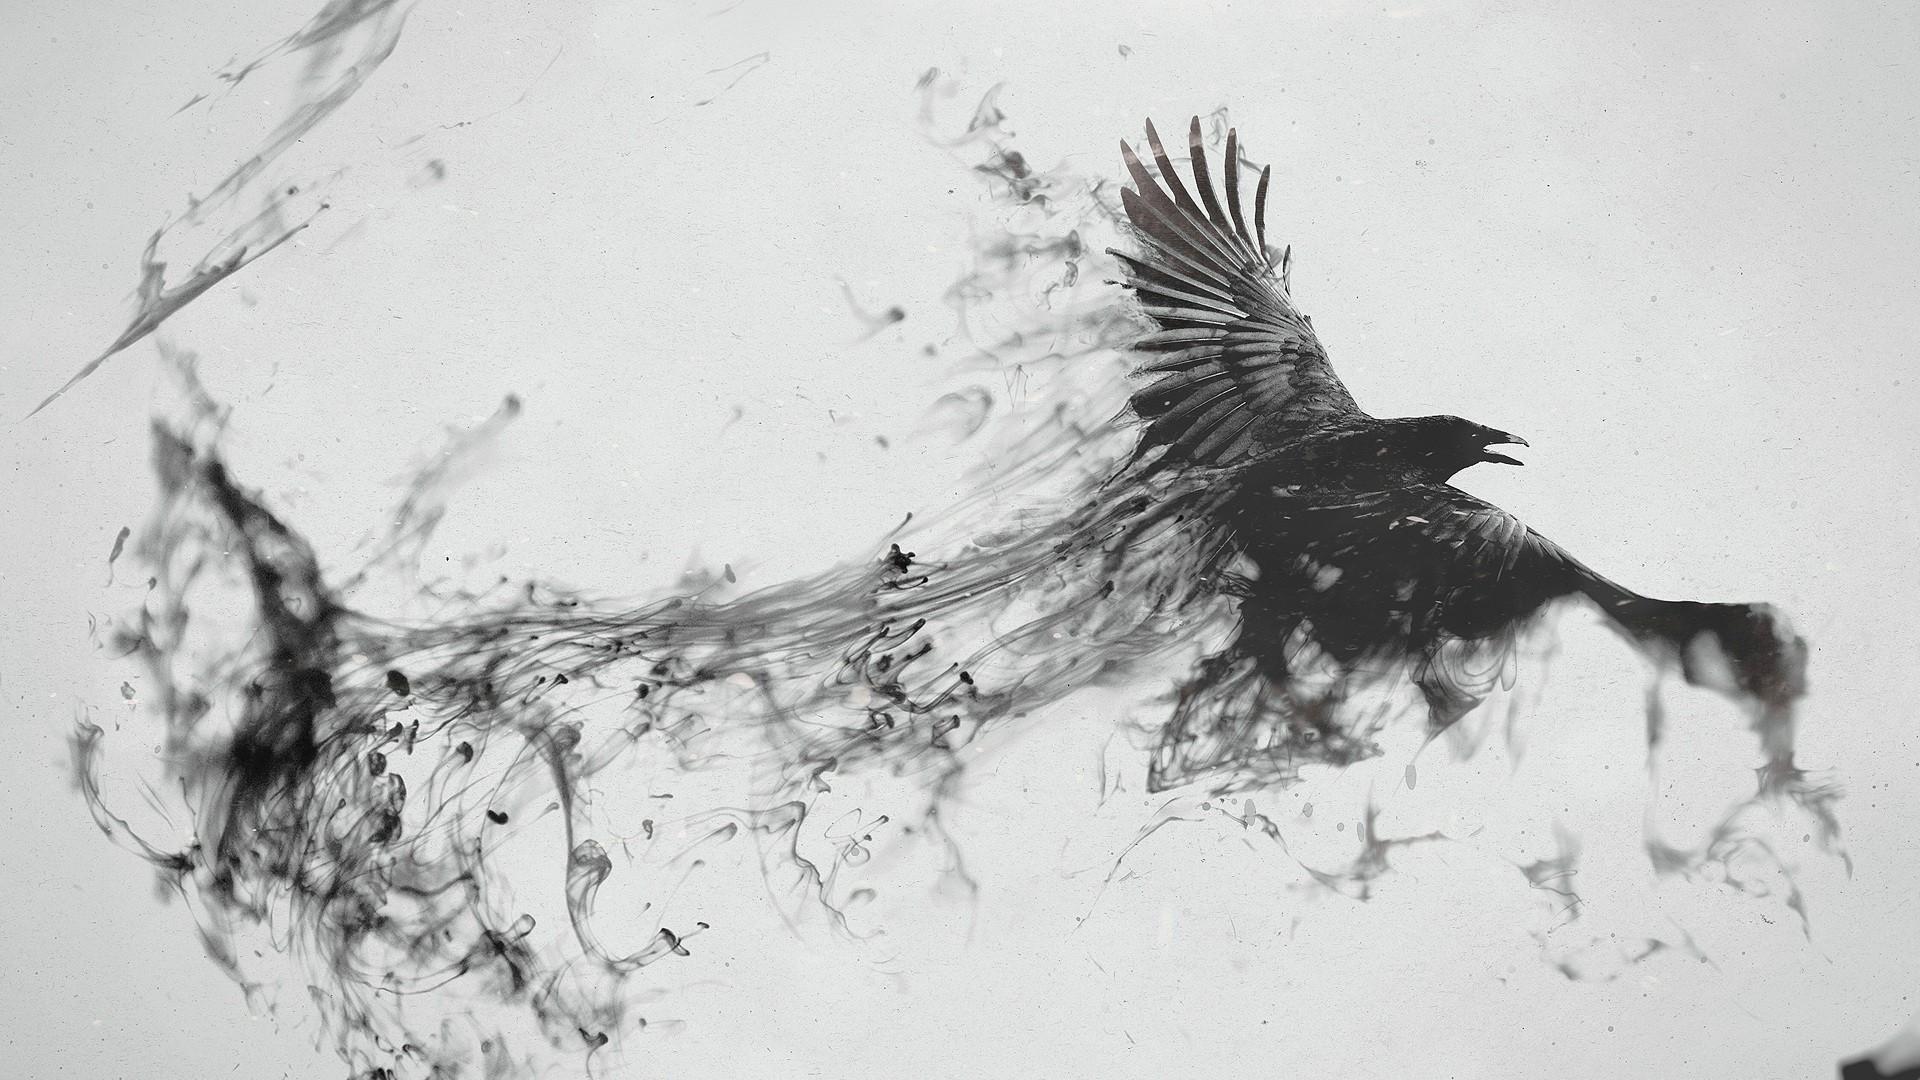 Wallpaper Gambar Burung Burung Satu Warna Burung